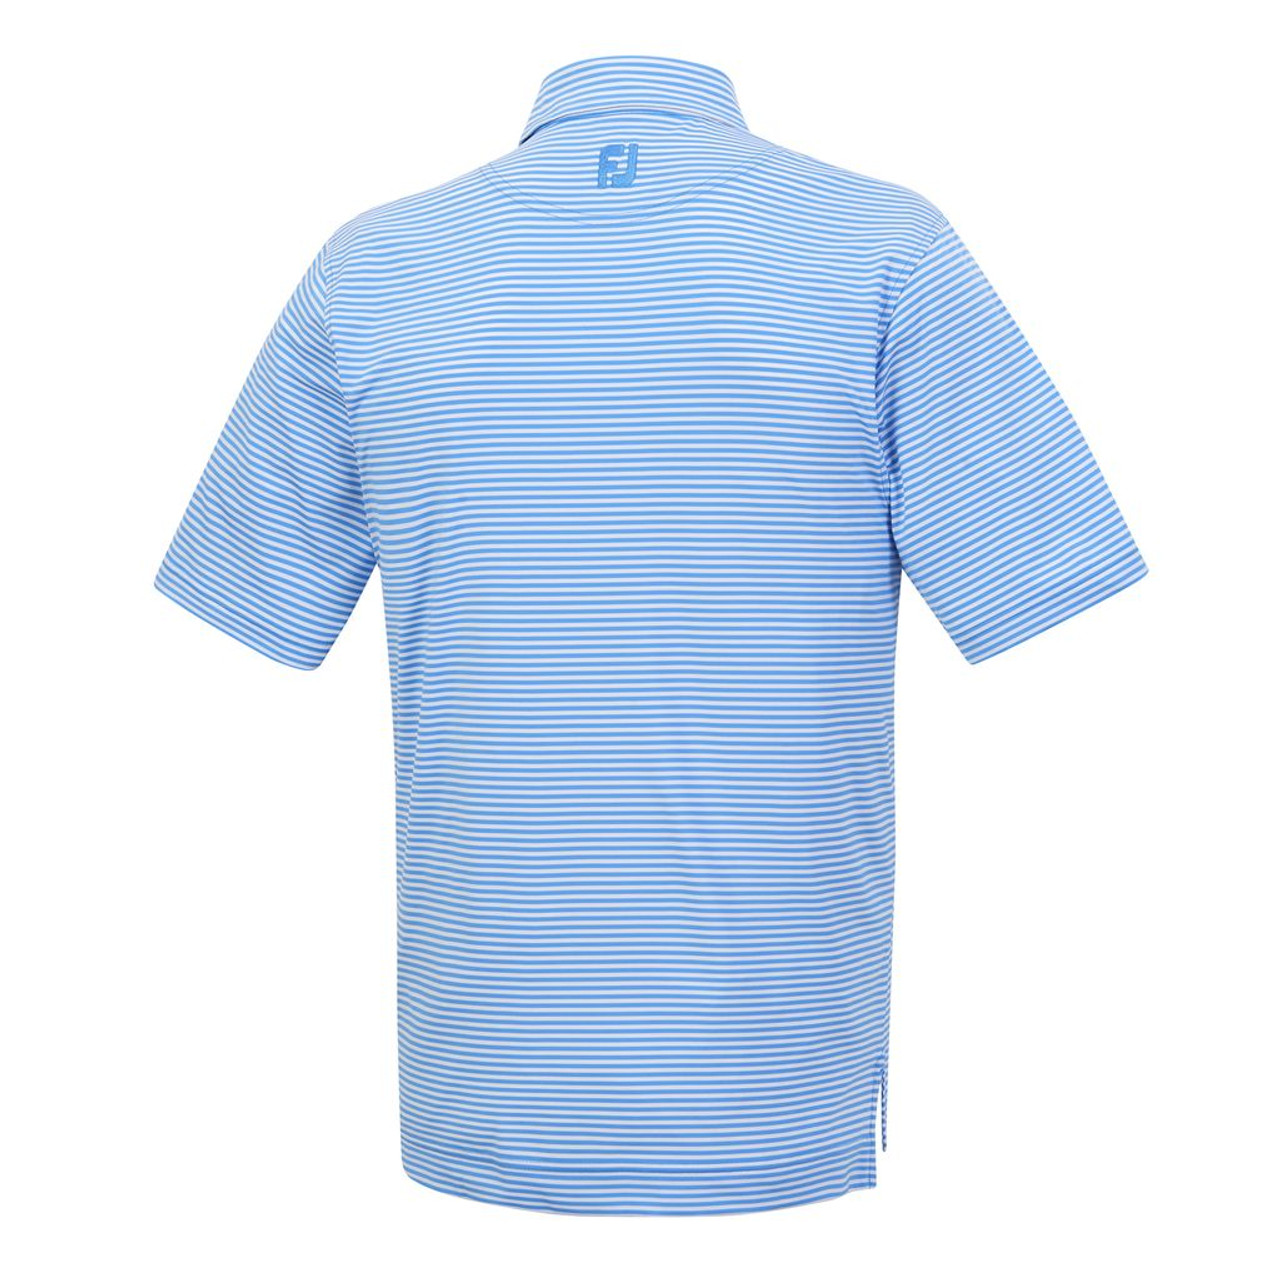 Reef Blue / White (22159)